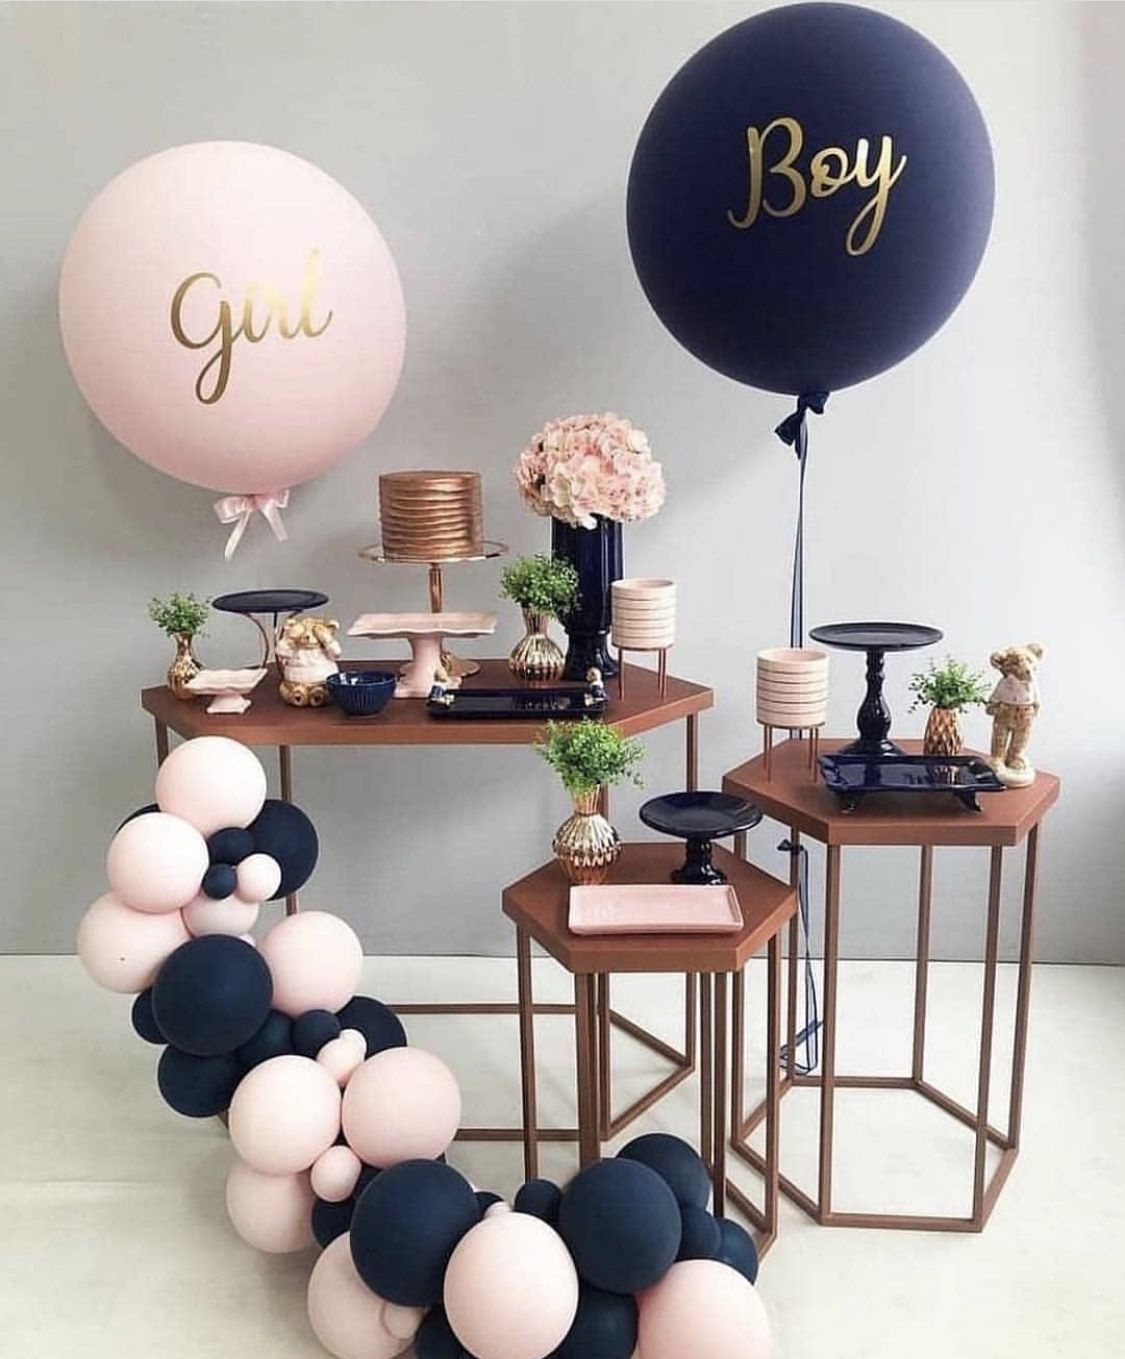 Pin by Destiny Moiza on Baby Stuff Creative baby shower